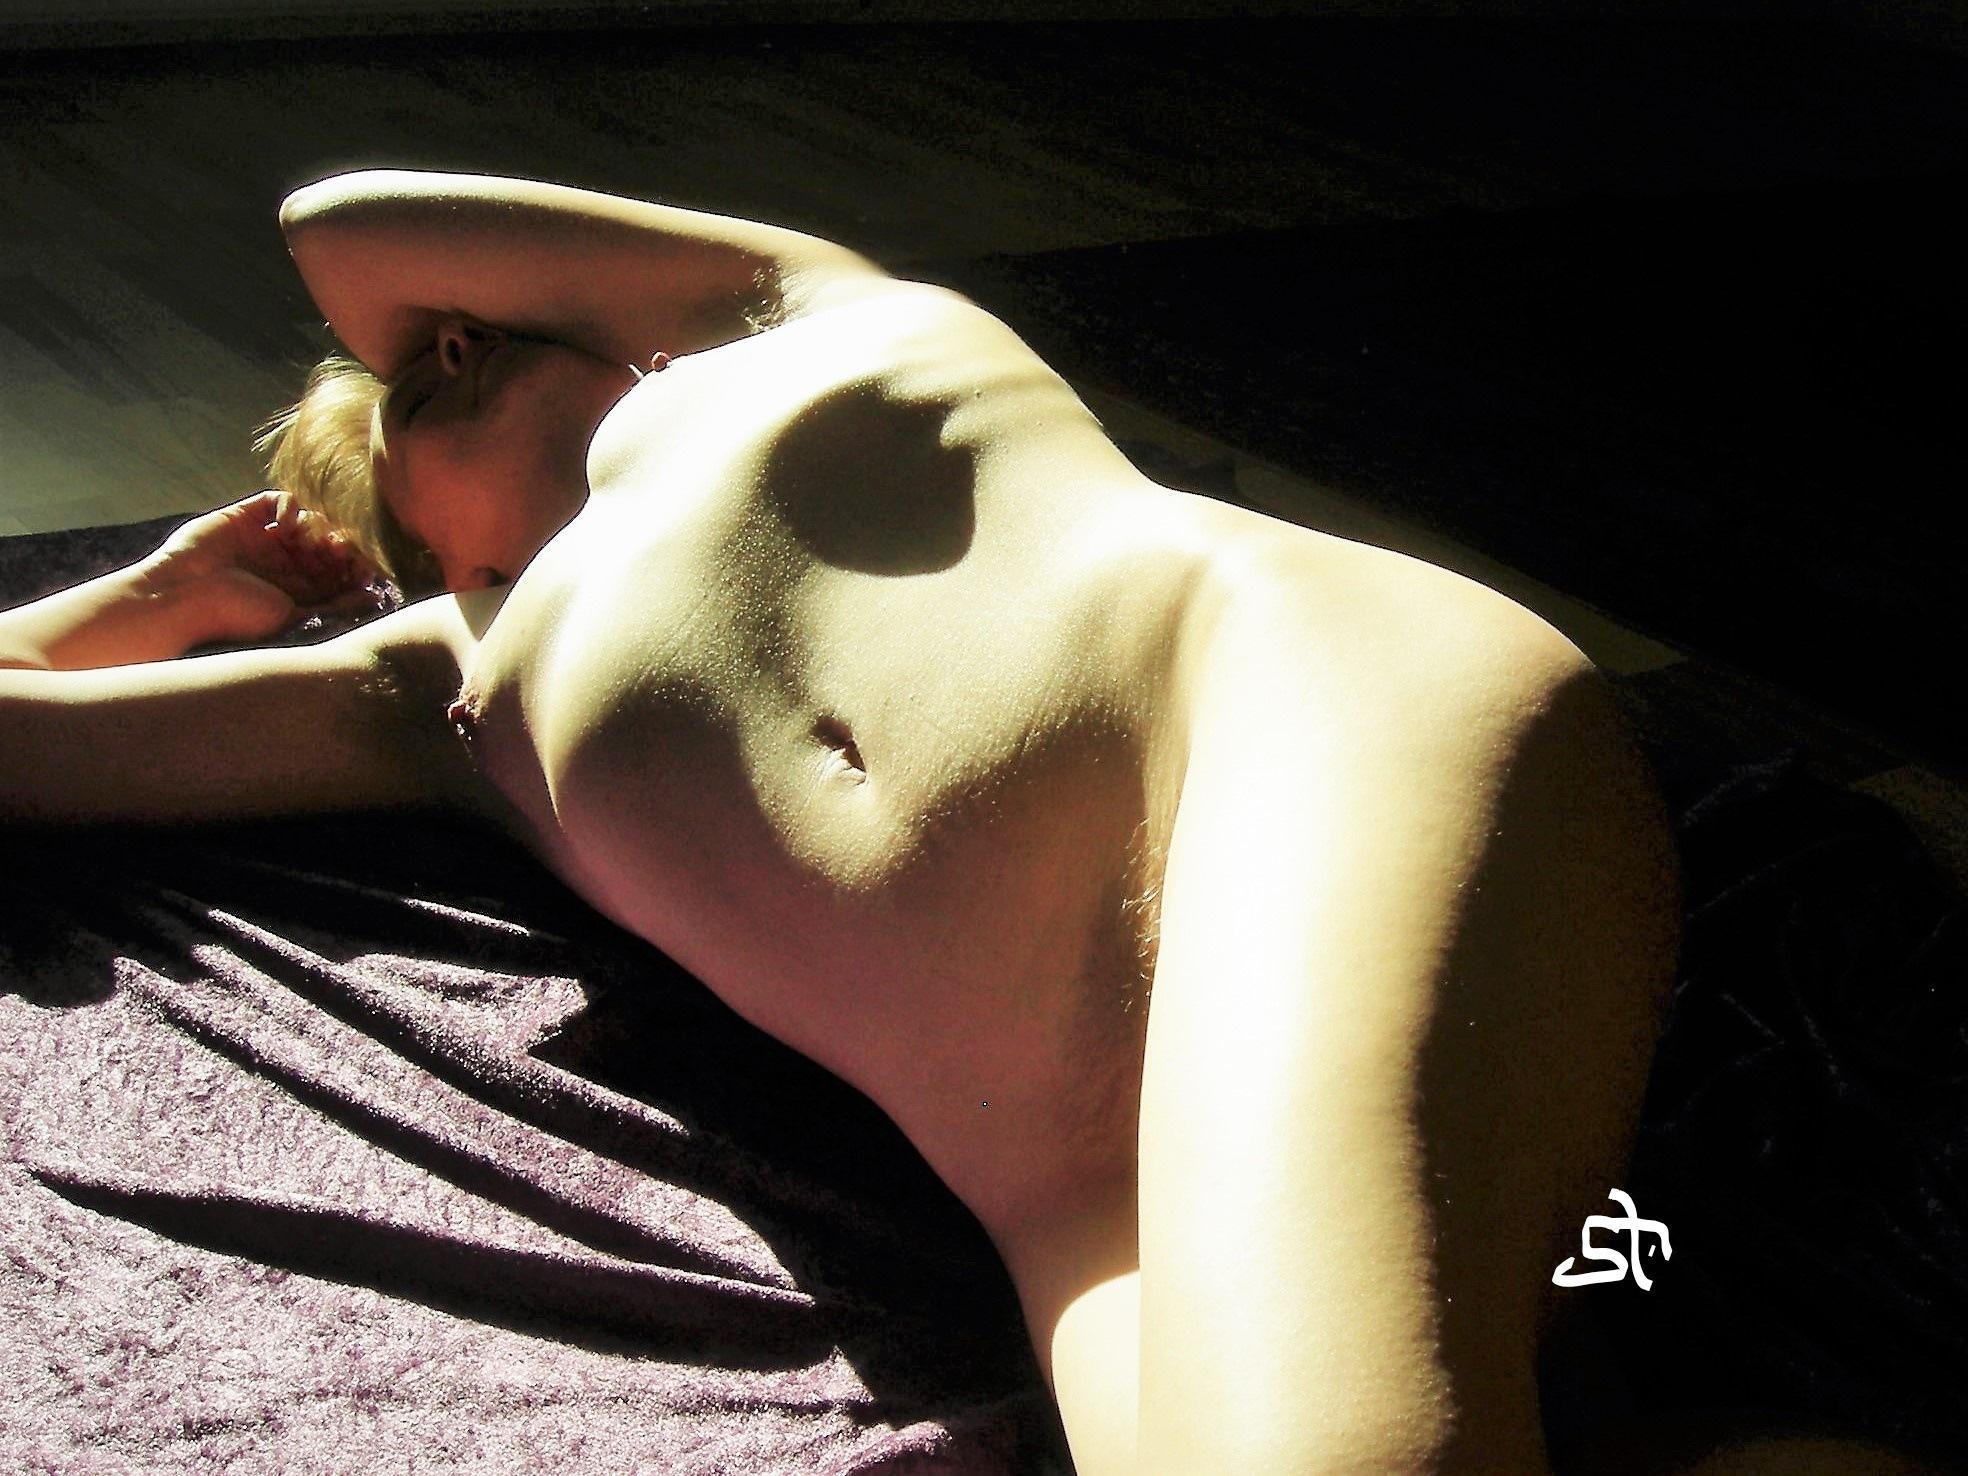 The ghost. by Joergen Hansen